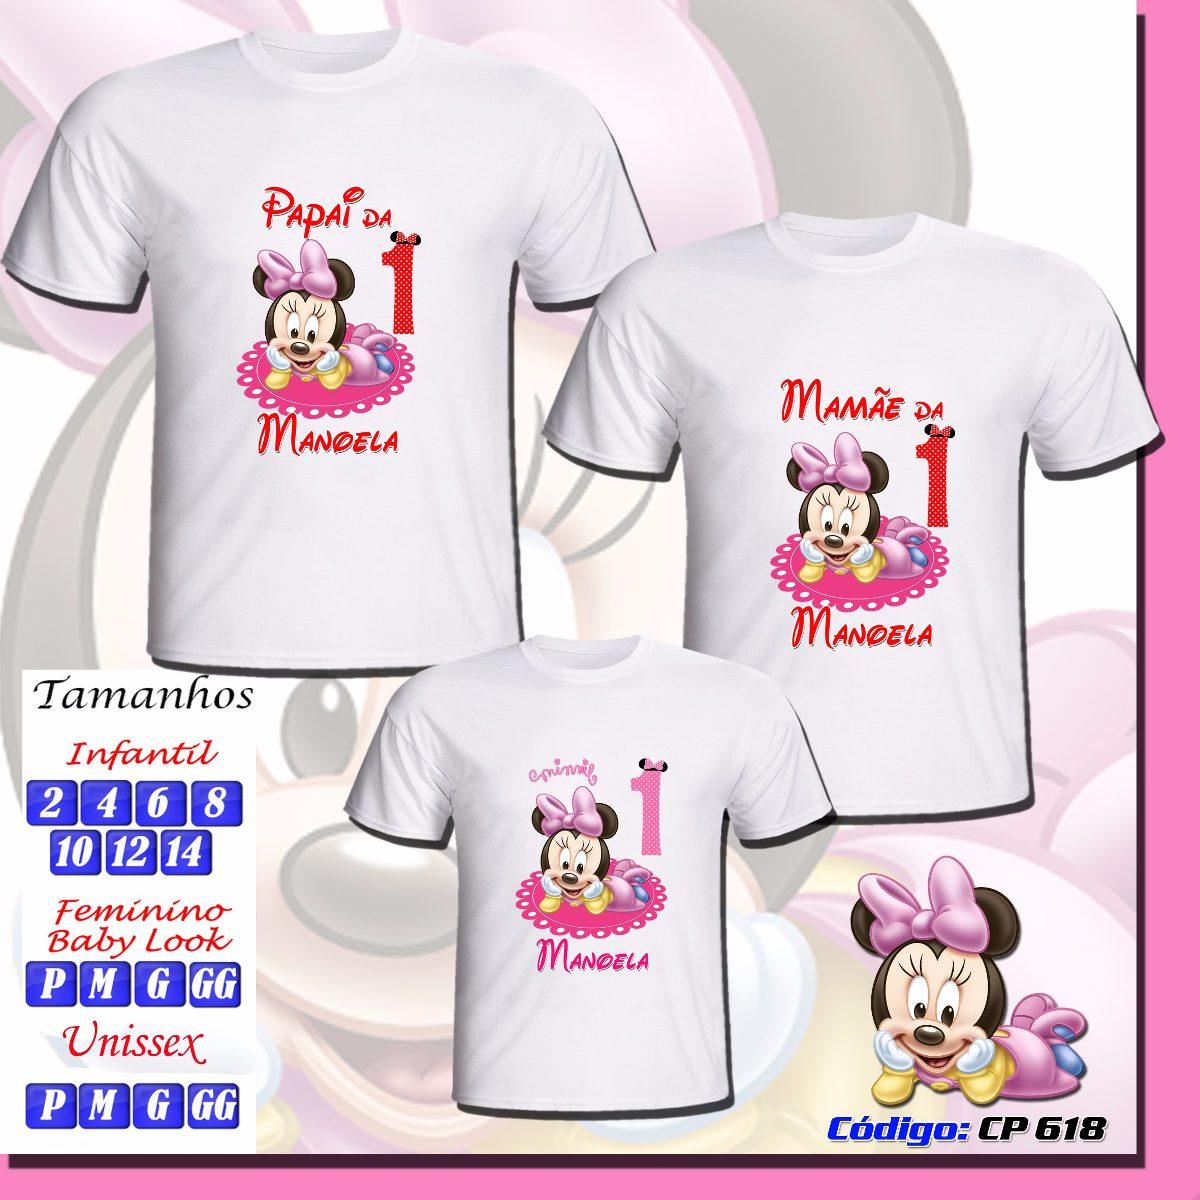 kit 03 camisetas infantil adulto personalizadas minnie. Carregando zoom. e22a5d51965